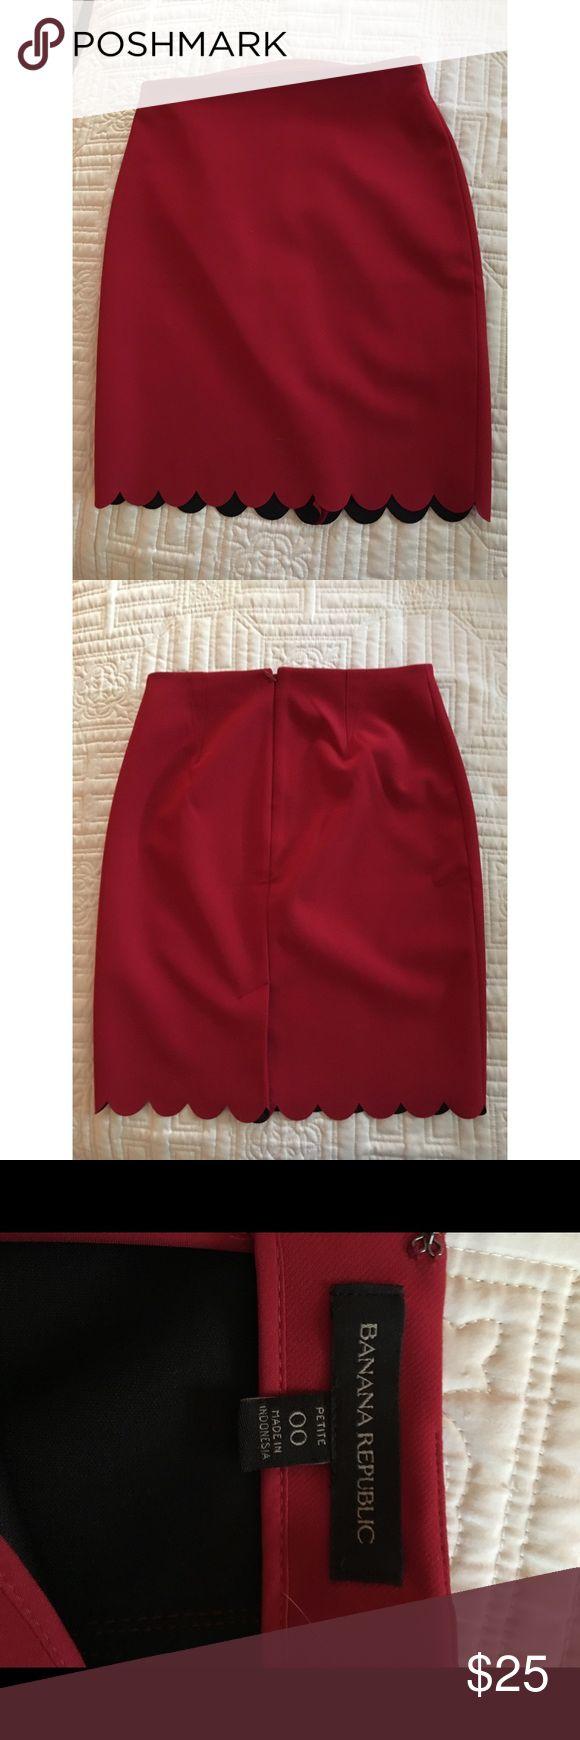 Banana republic pencil skirt Red petite pencil skirt 00 Banana Republic Skirts Pencil